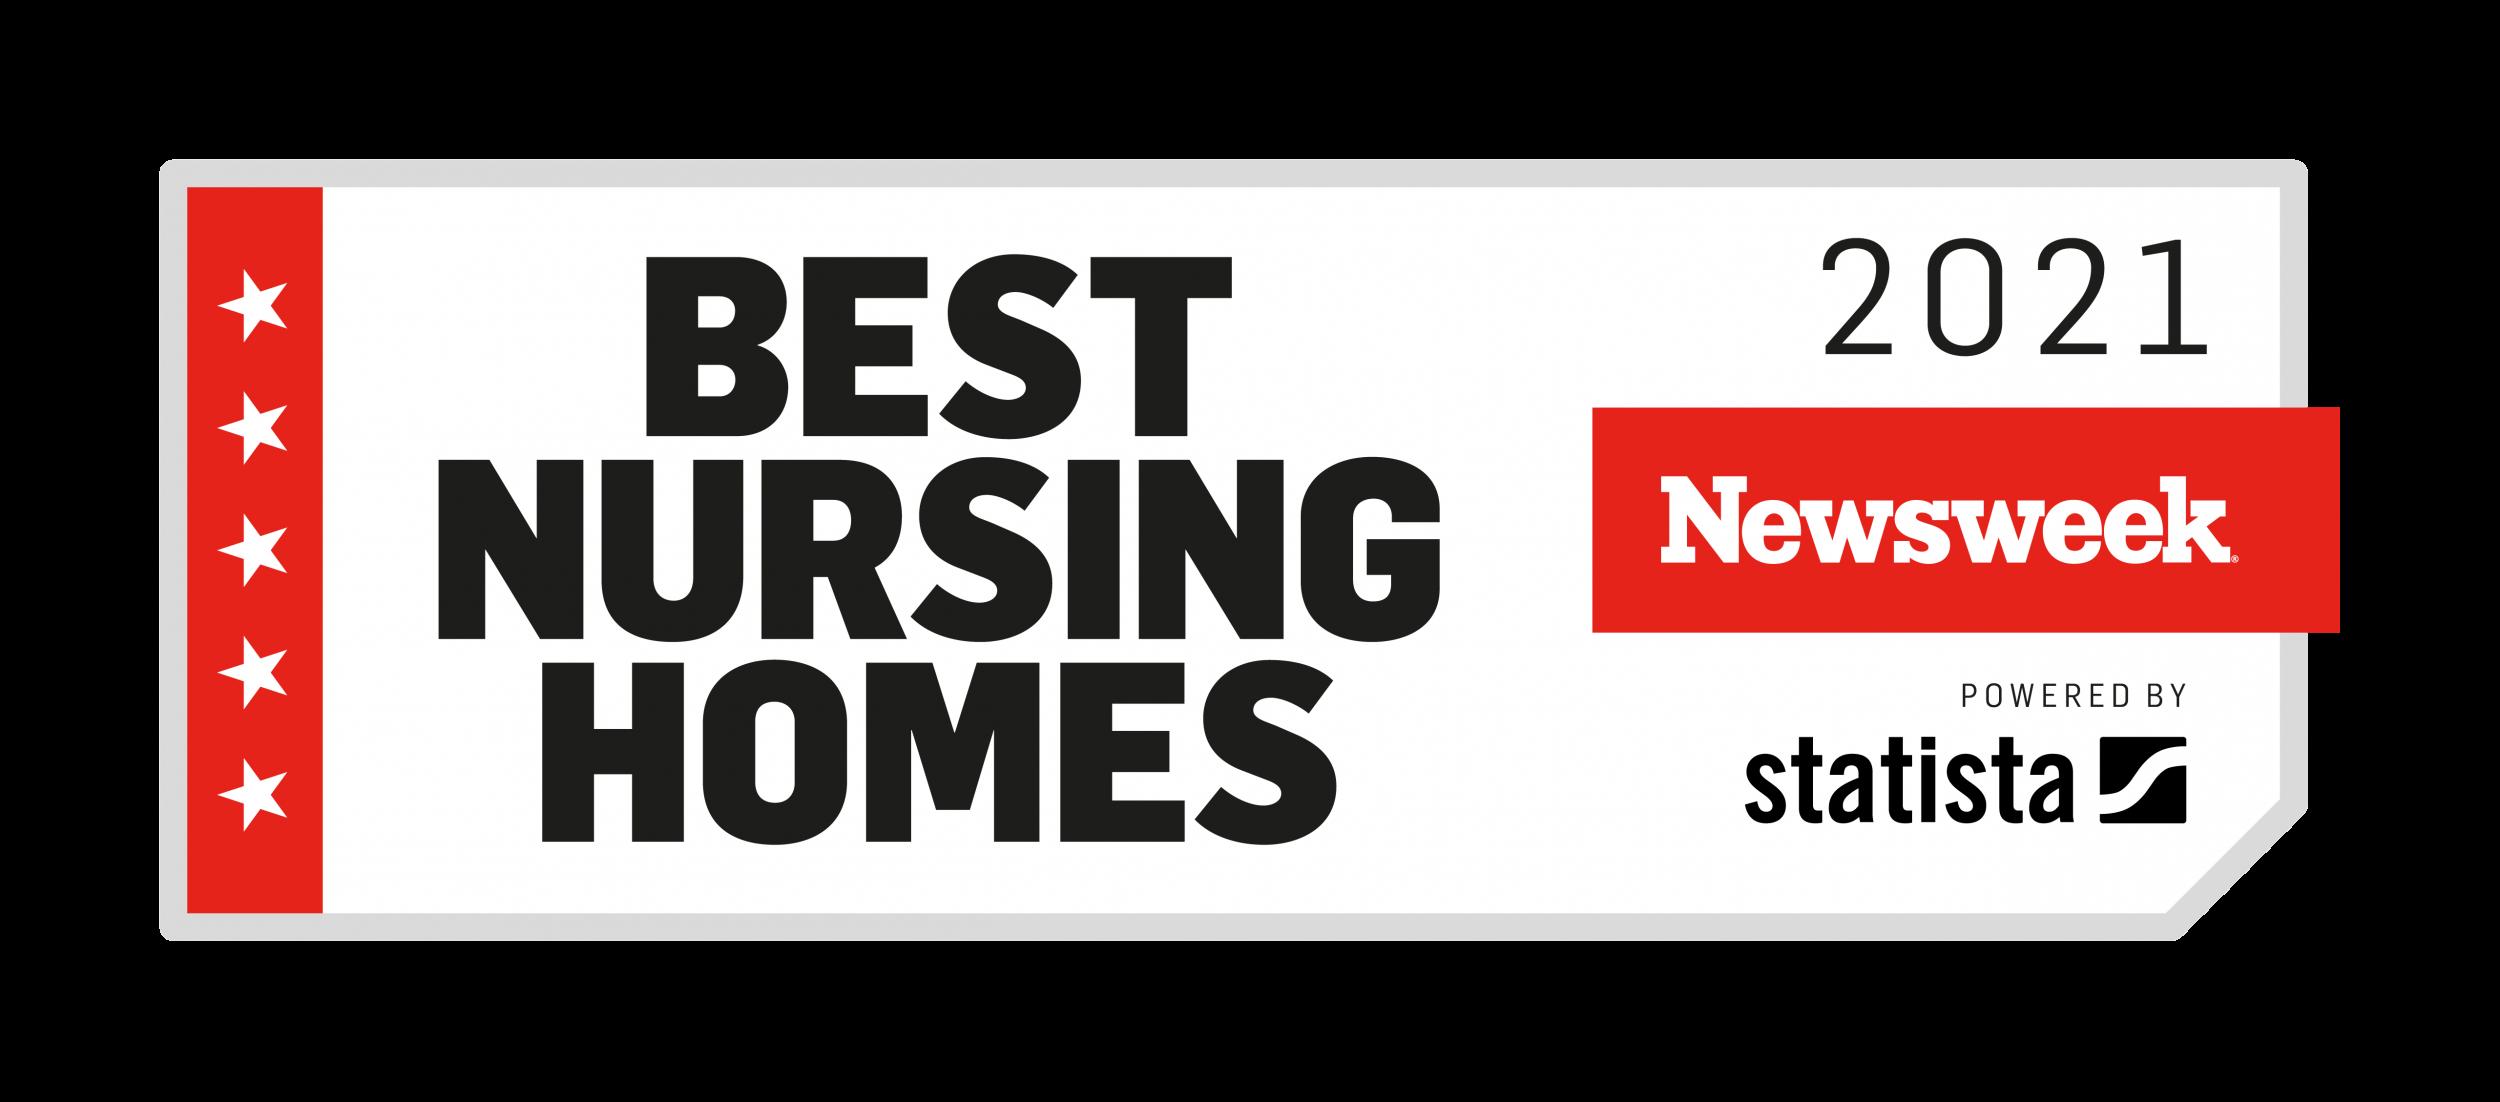 Best Nursing Homes 2021